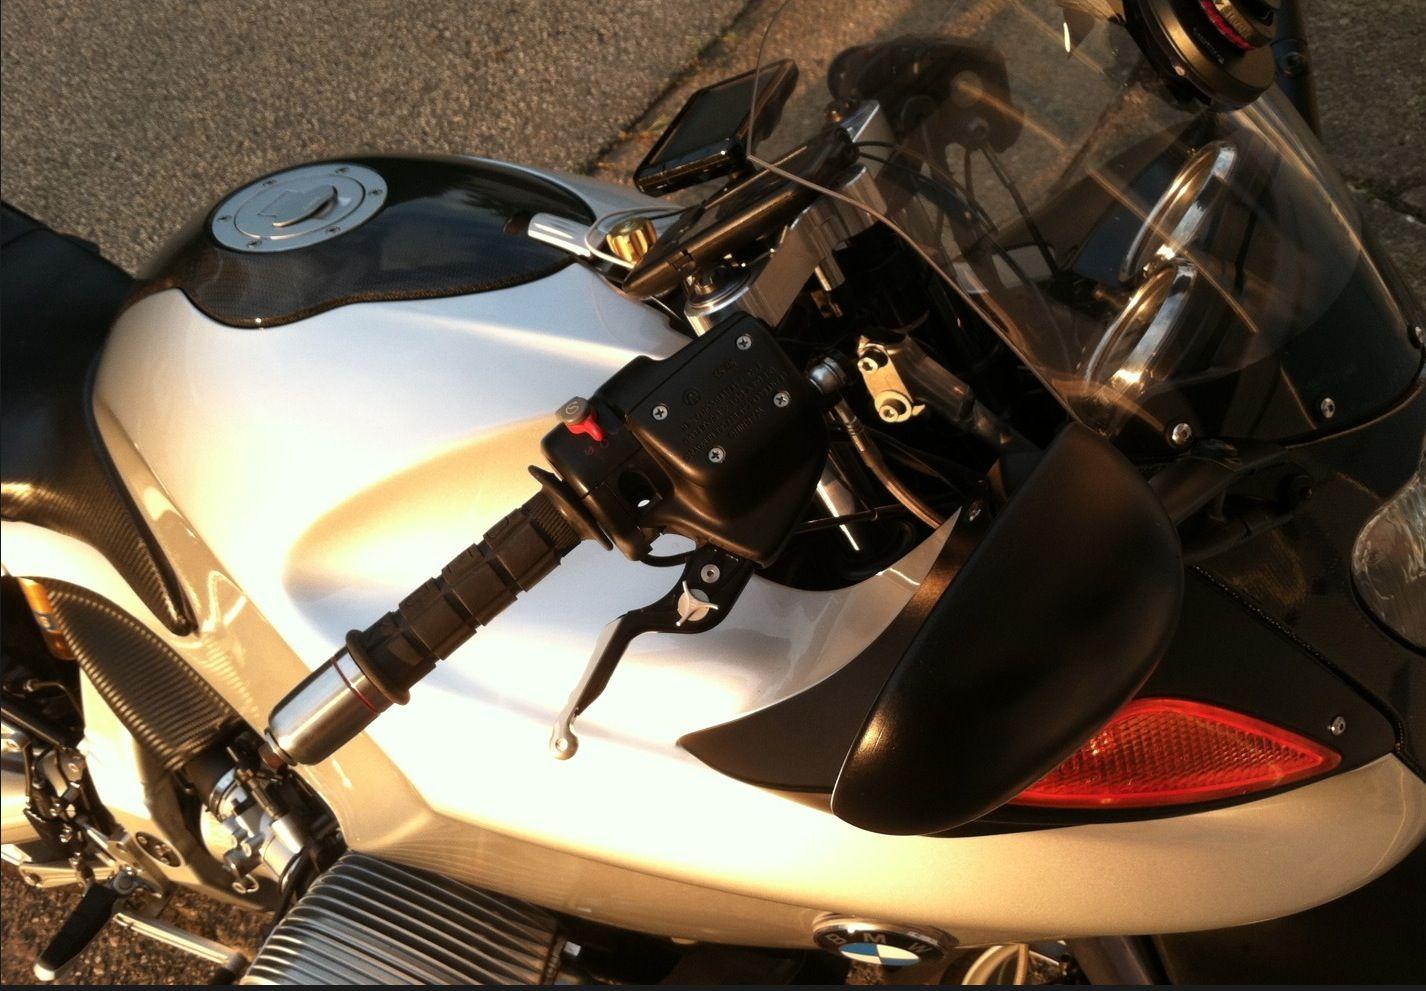 Wunderlich Brake Levers BMW r1100s Bmw, Sports car, Yamaha